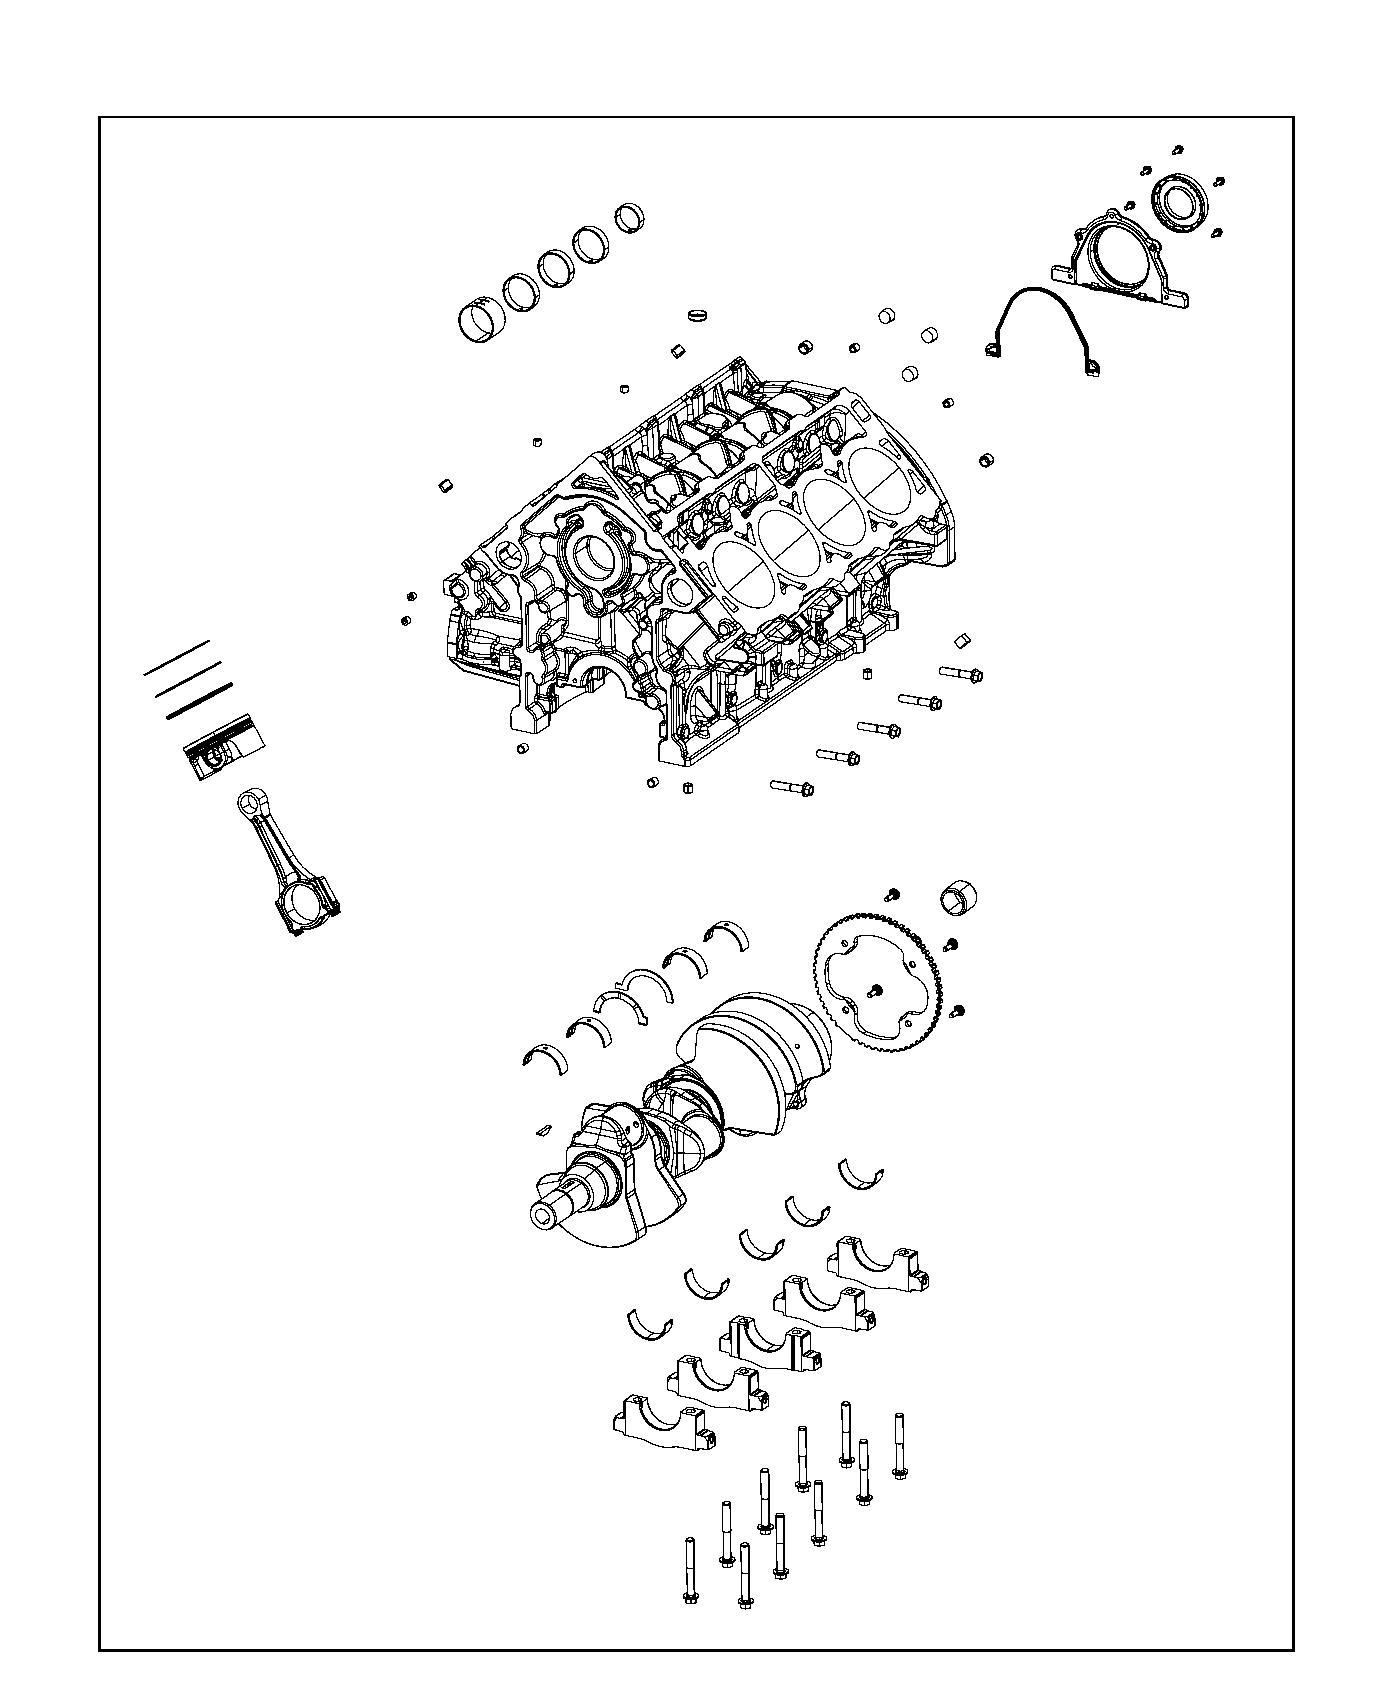 Chrysler 300 Crankshaft Crew Cab Damper Bearings